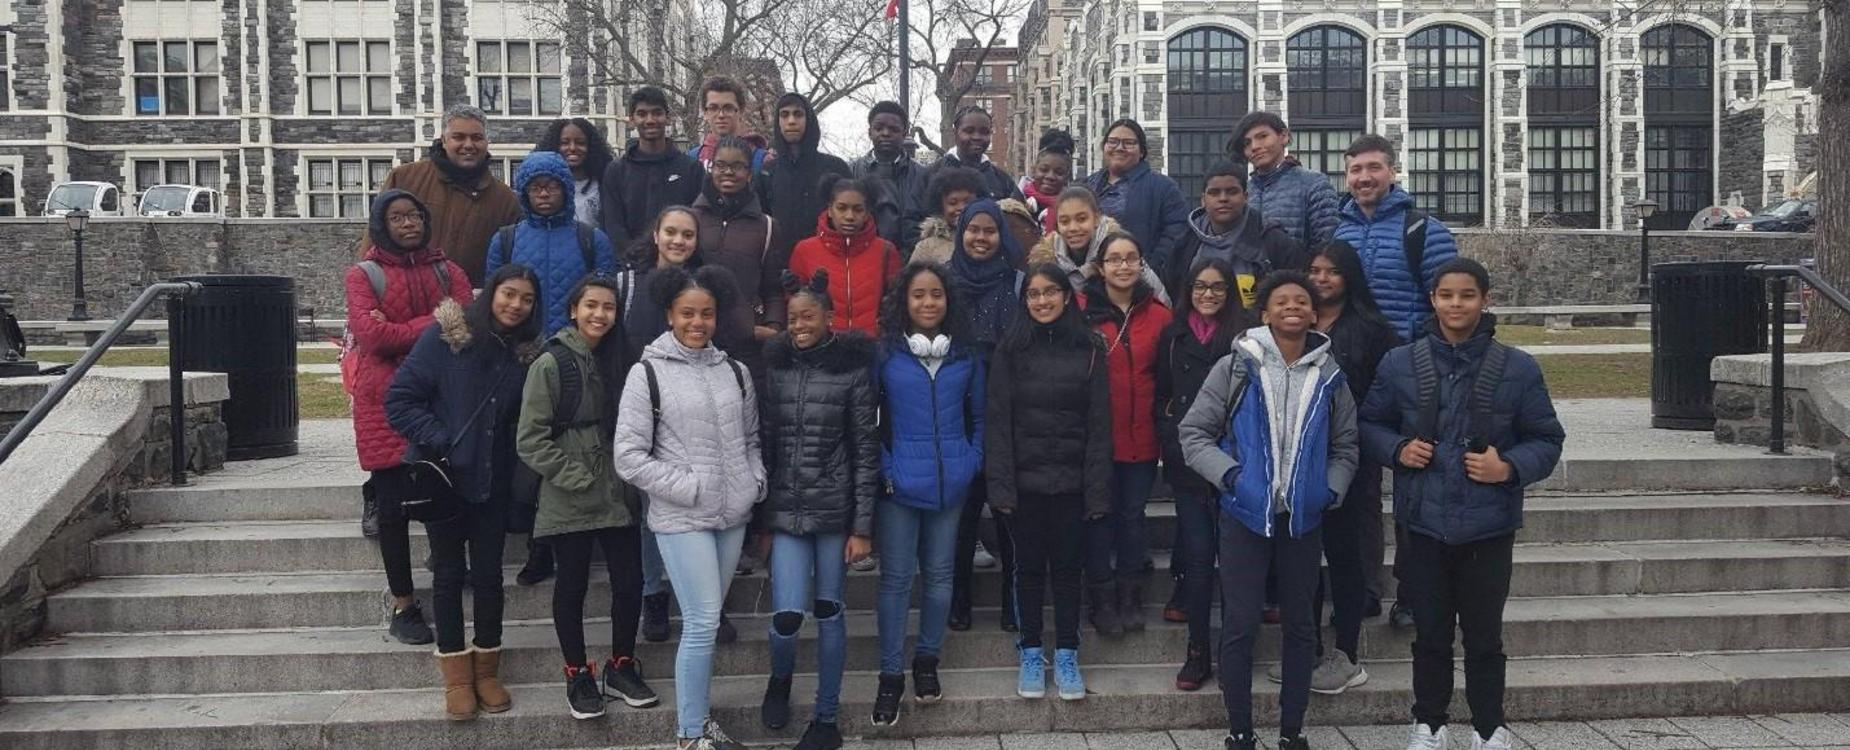 college trip to Cornell University